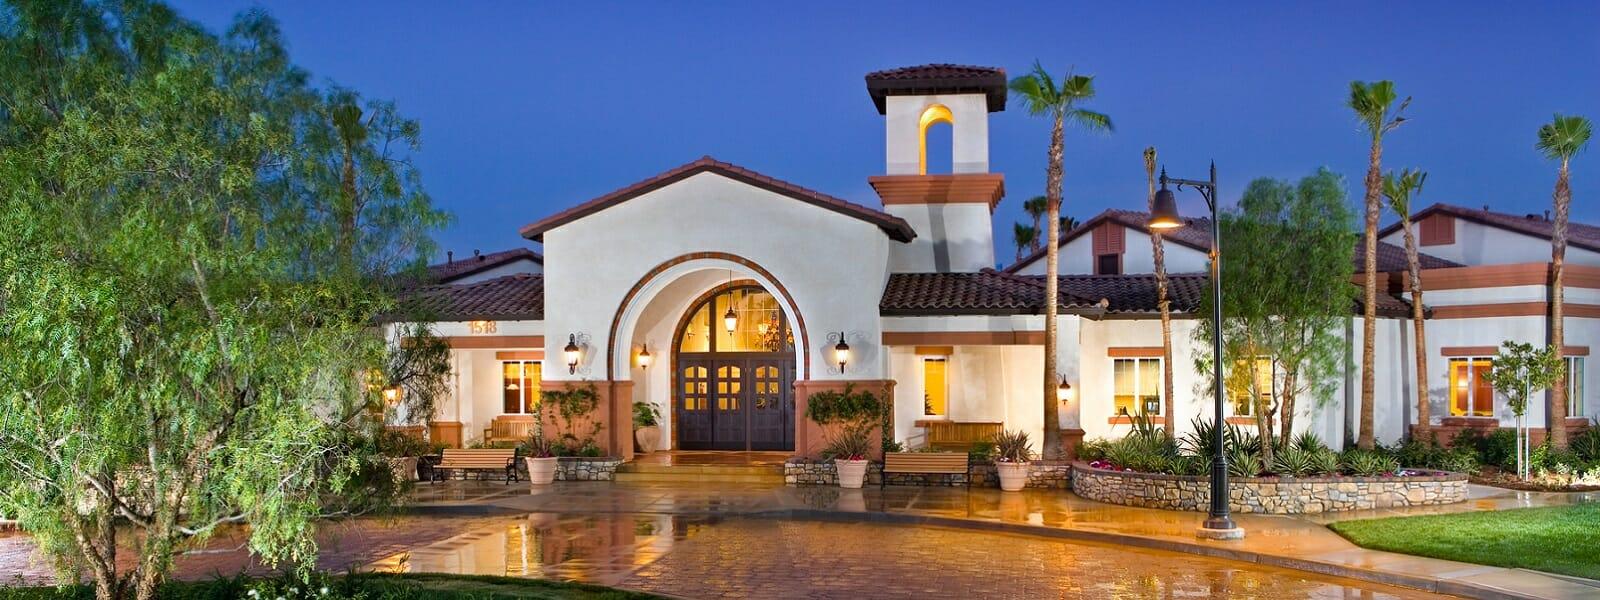 K Hov Beaumont | California Resort Communities | Retire to CA